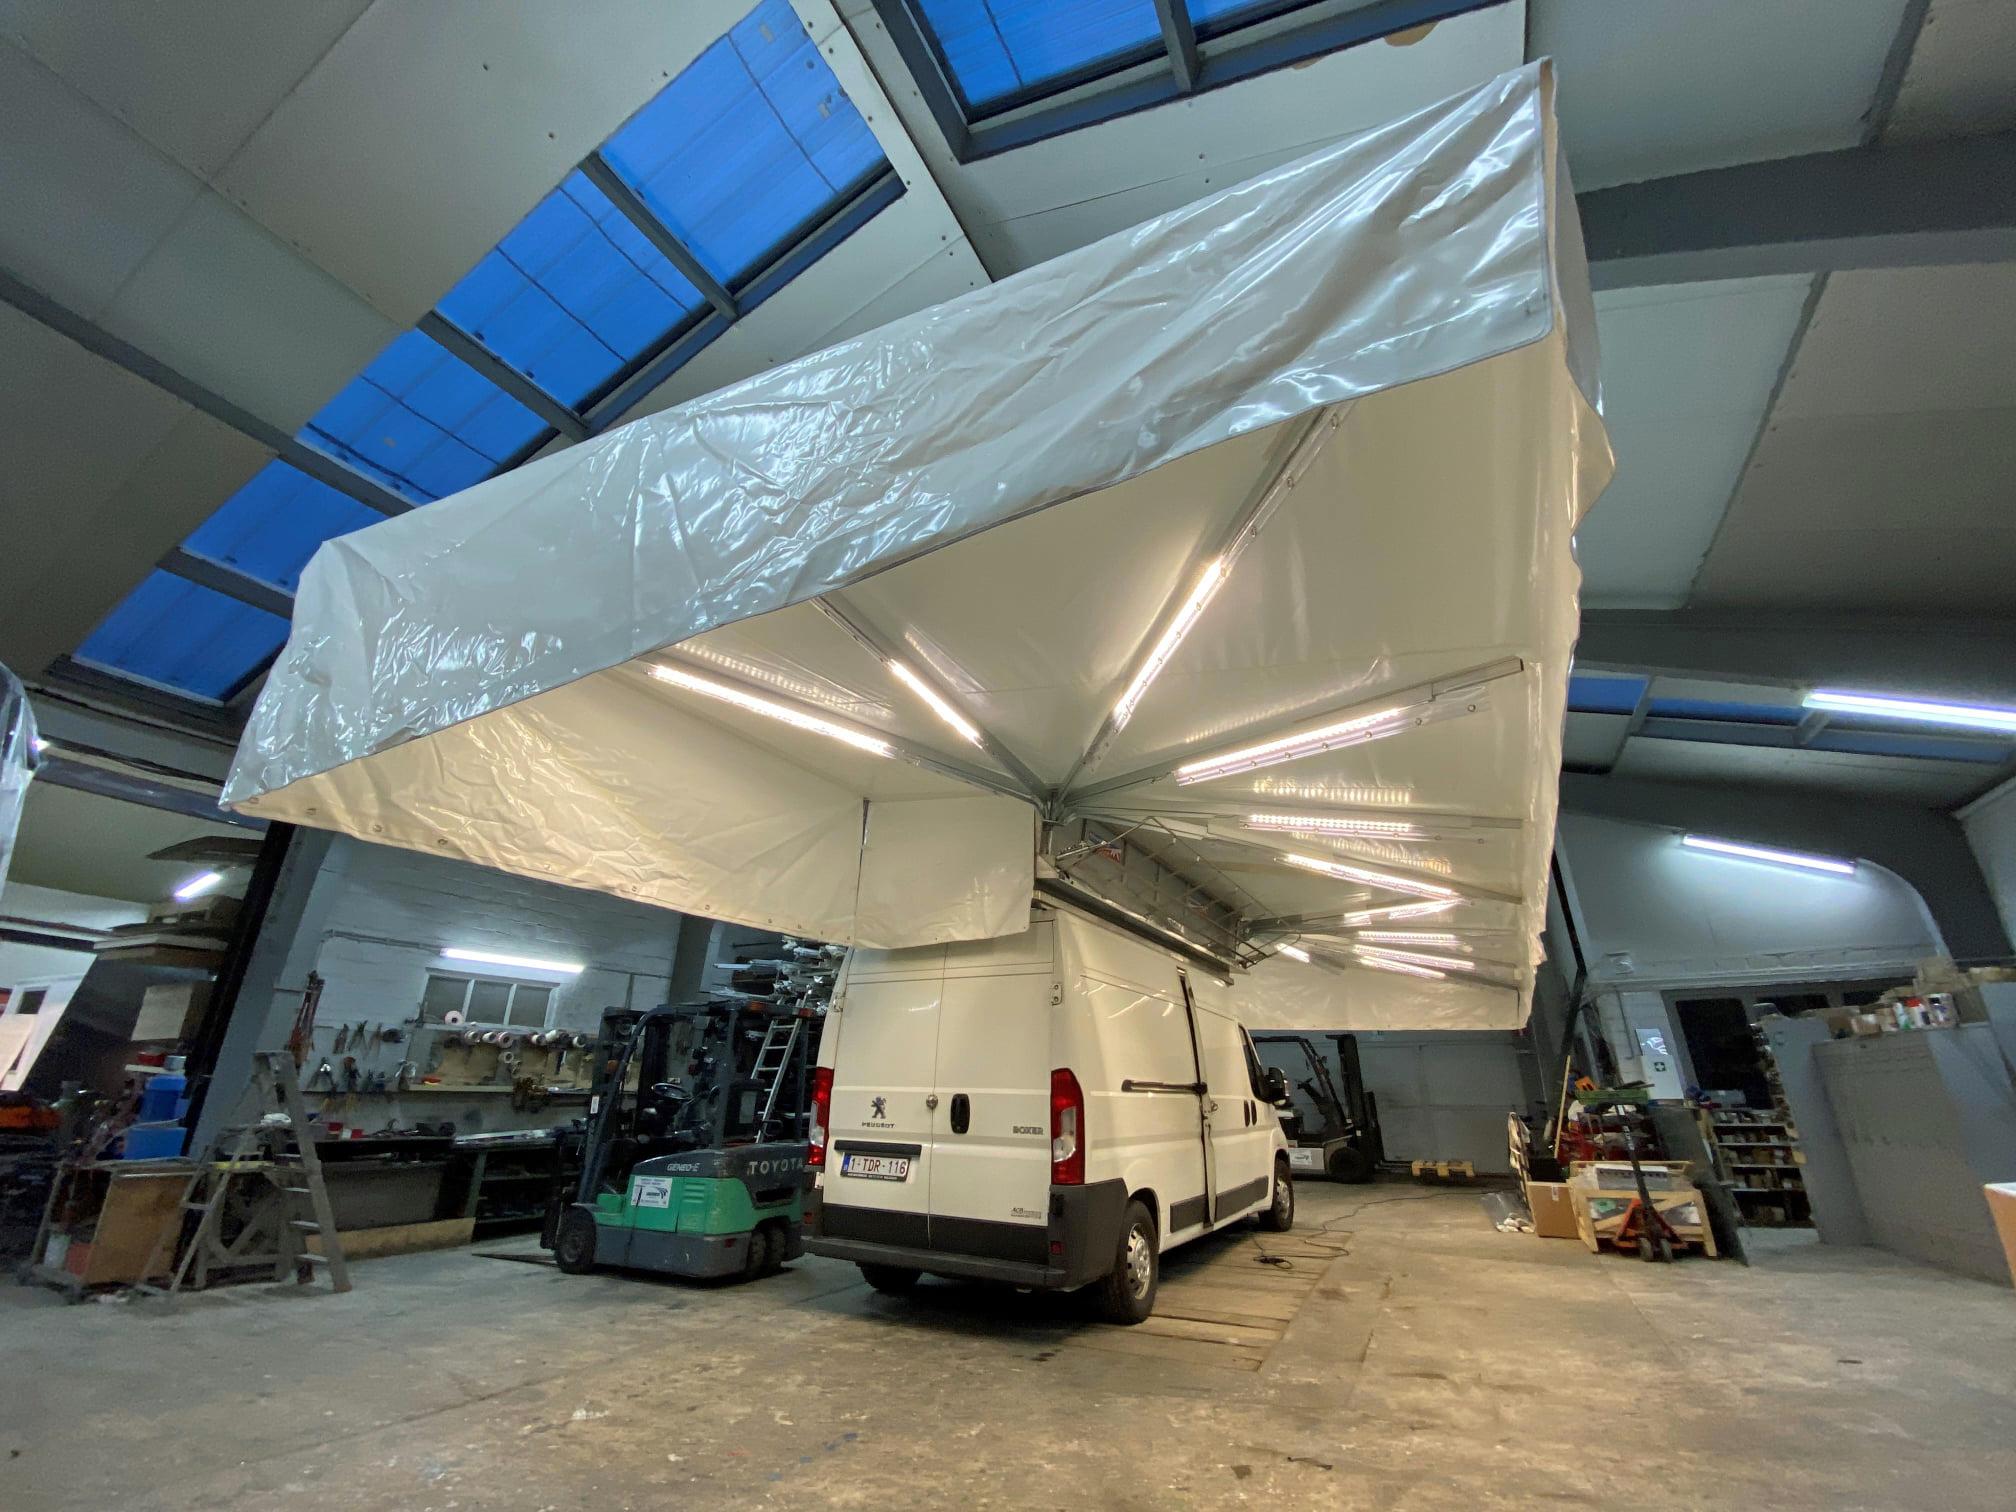 Peugeot-met-tentsysteem-lan-g-12-mtr-breed-4-30--(4)